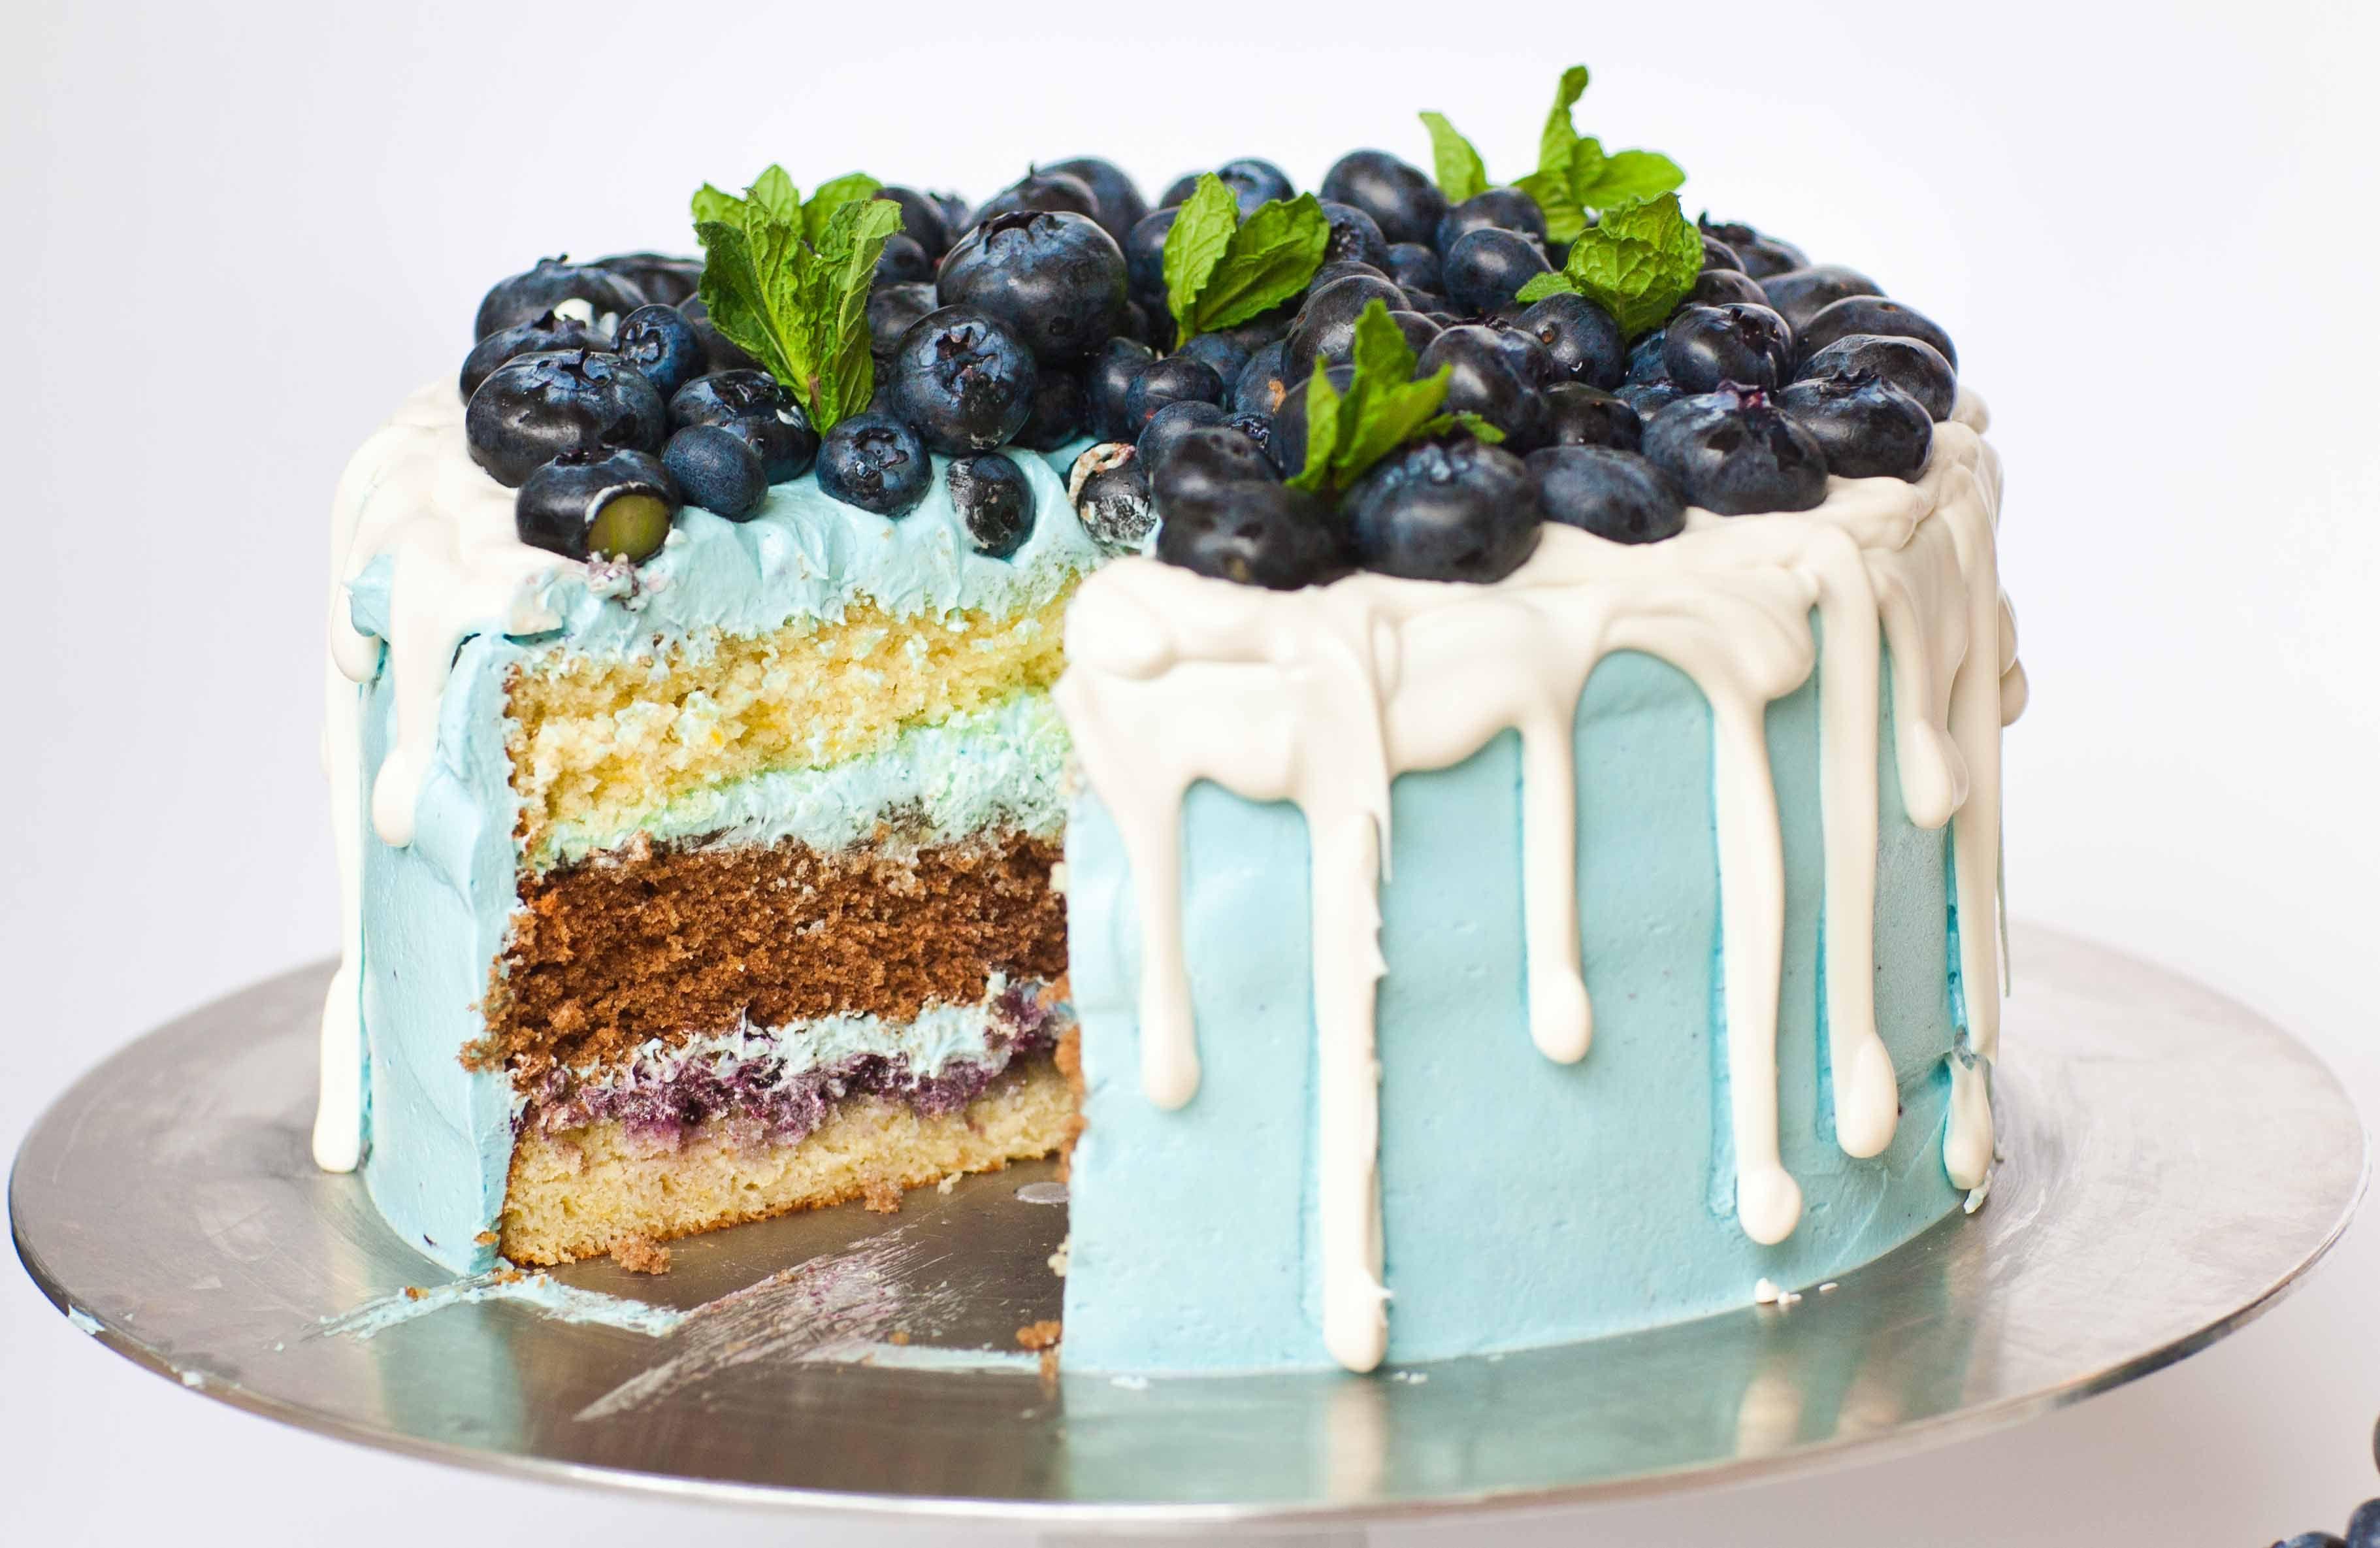 Lemon Blueberry Cake Video Tatyanas Everyday Food Recipe Blueberry Lemon Cake Fruity Cake Cake